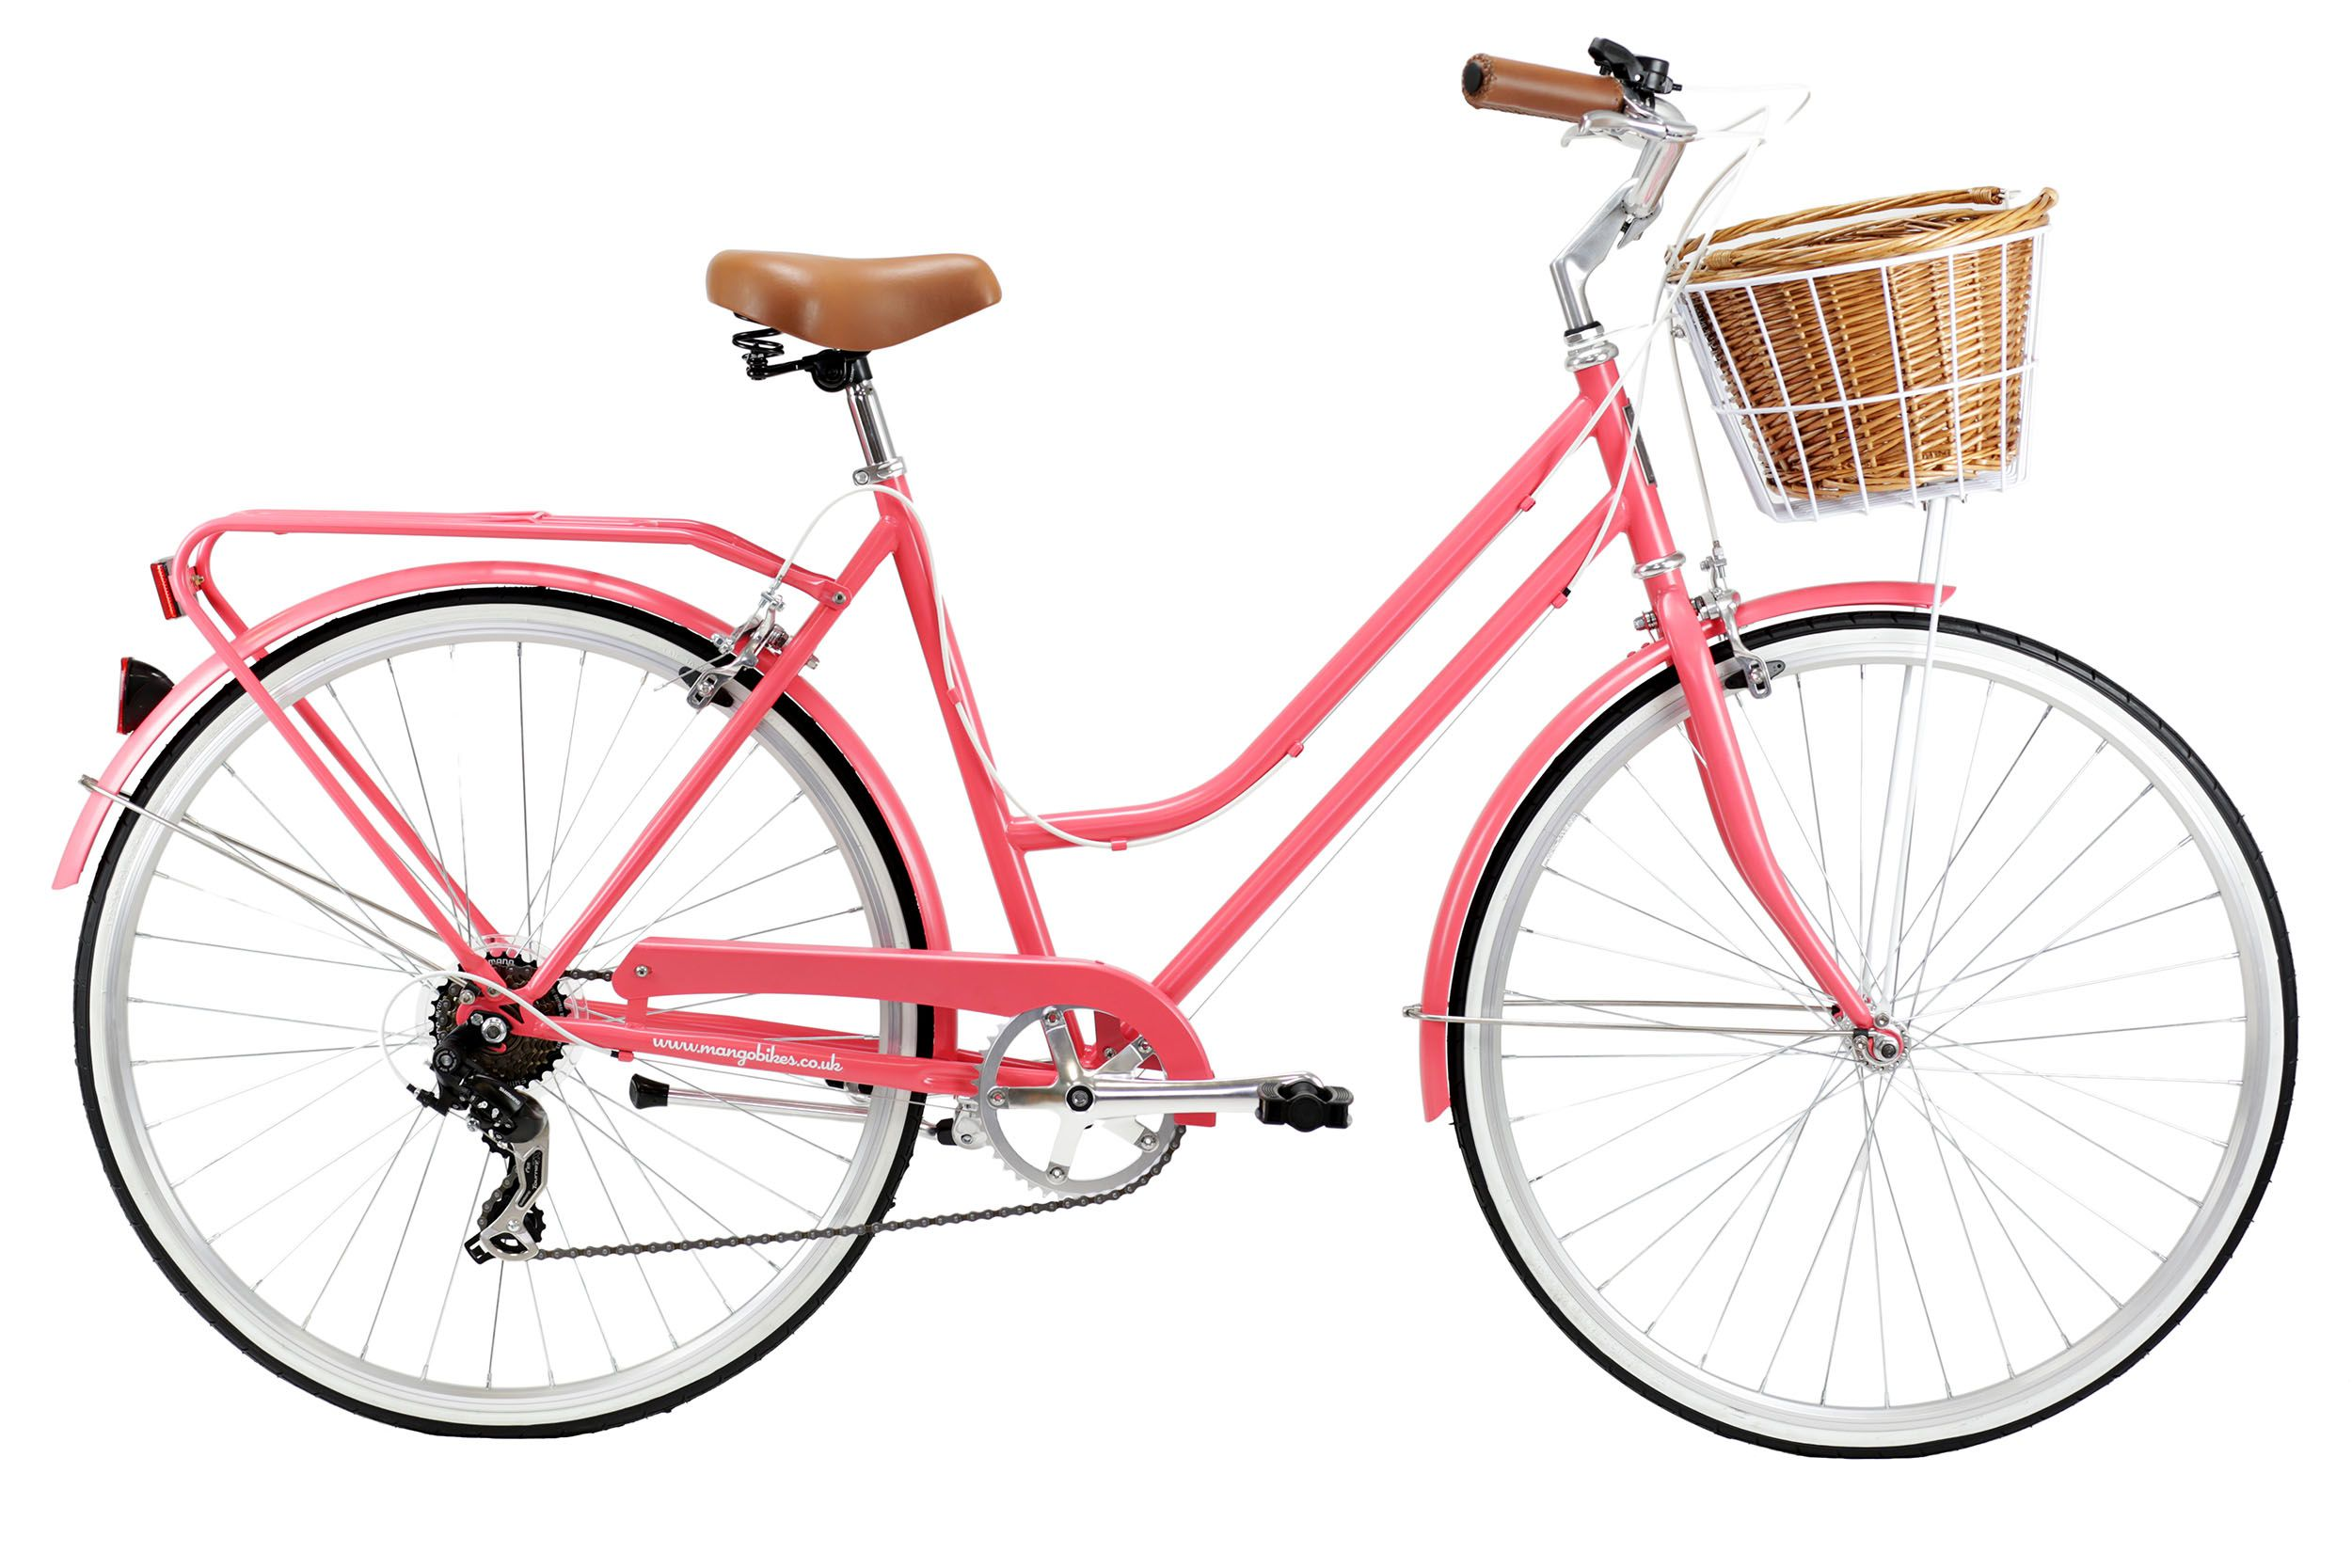 Pink Bike Classic bikes, Comfort bike, Simple bike